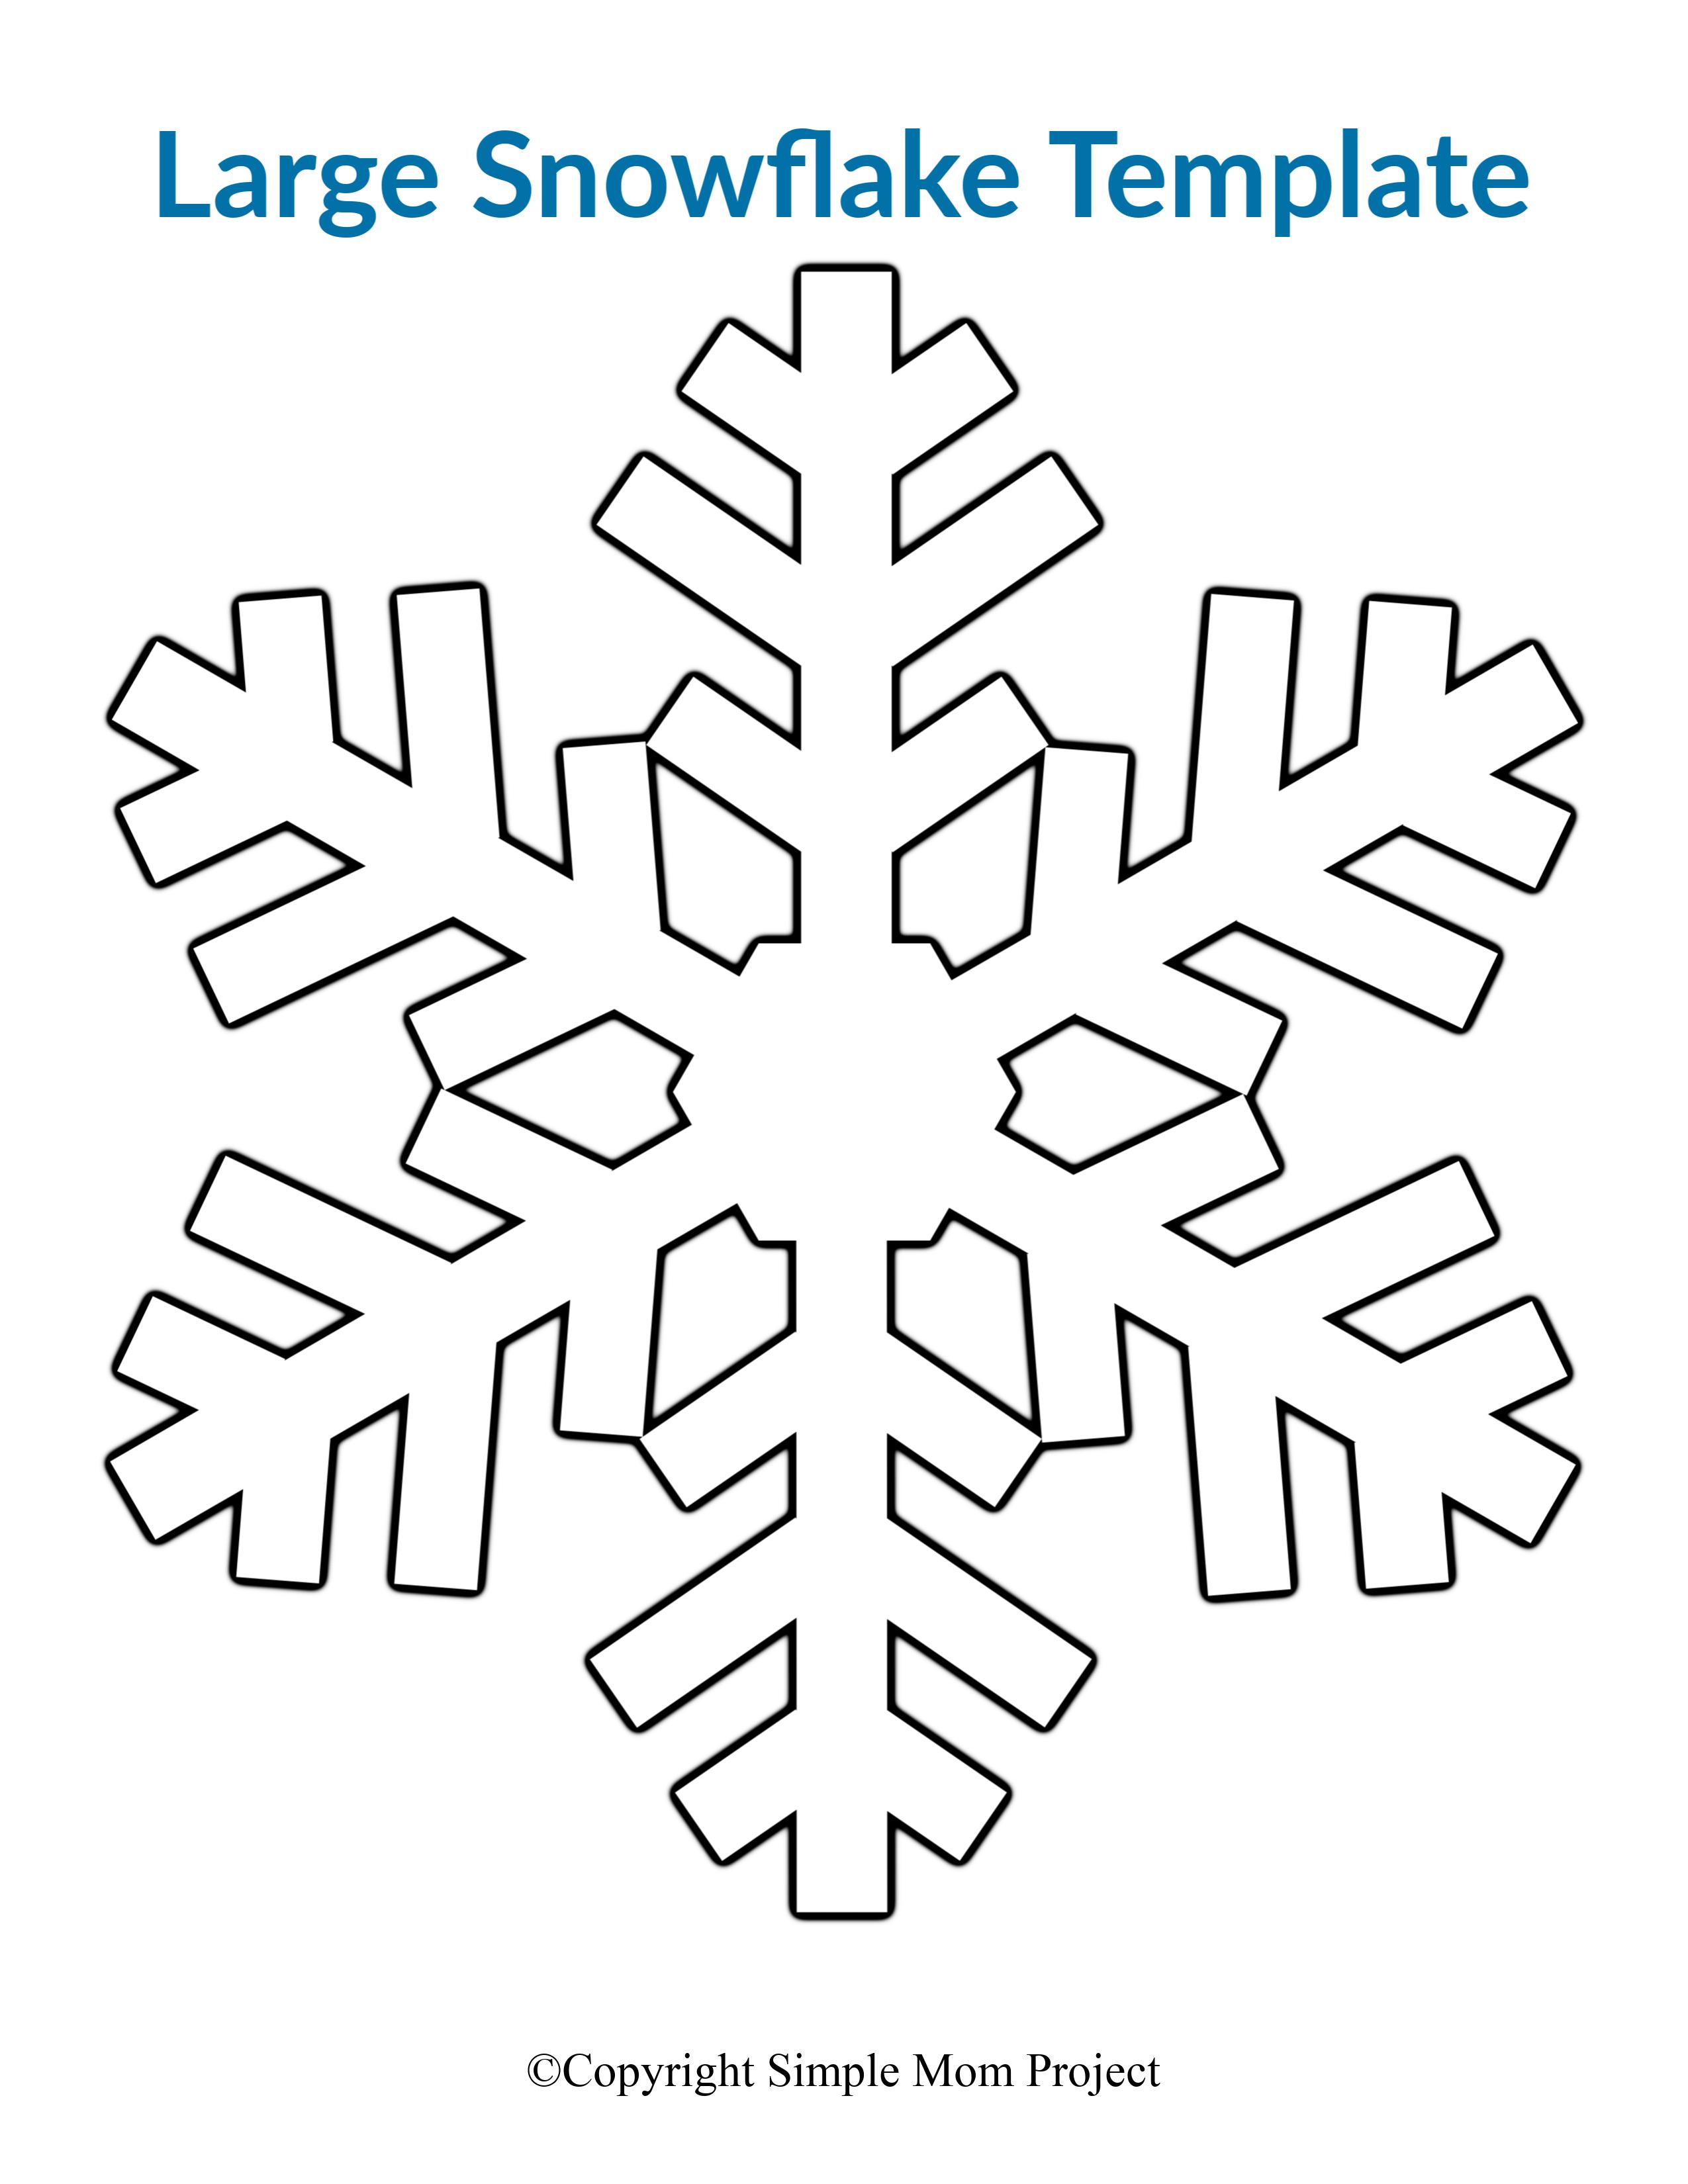 8 Free Printable Large Snowflake Templates - Simple Mom ...